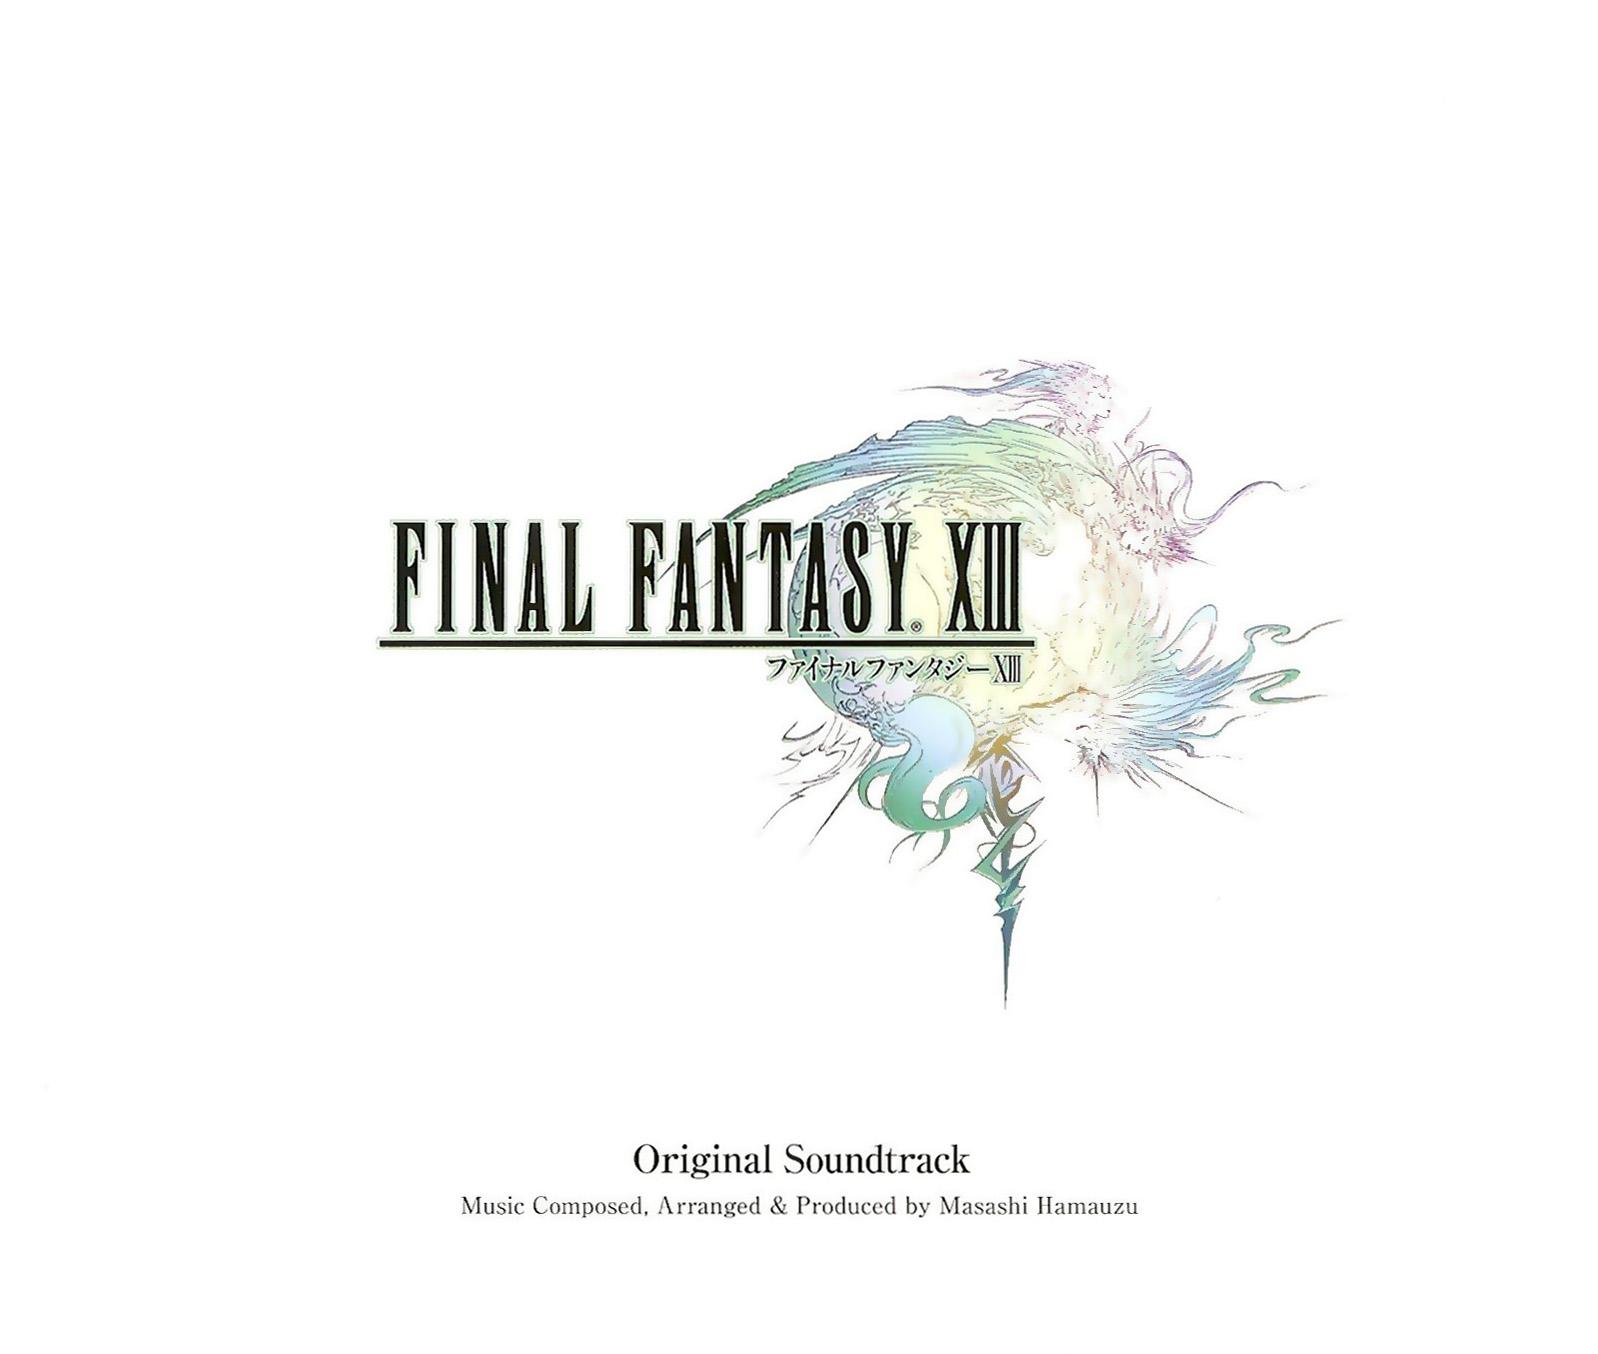 Aa' Game Sains: Music Track On Final Fantasy XV Radio